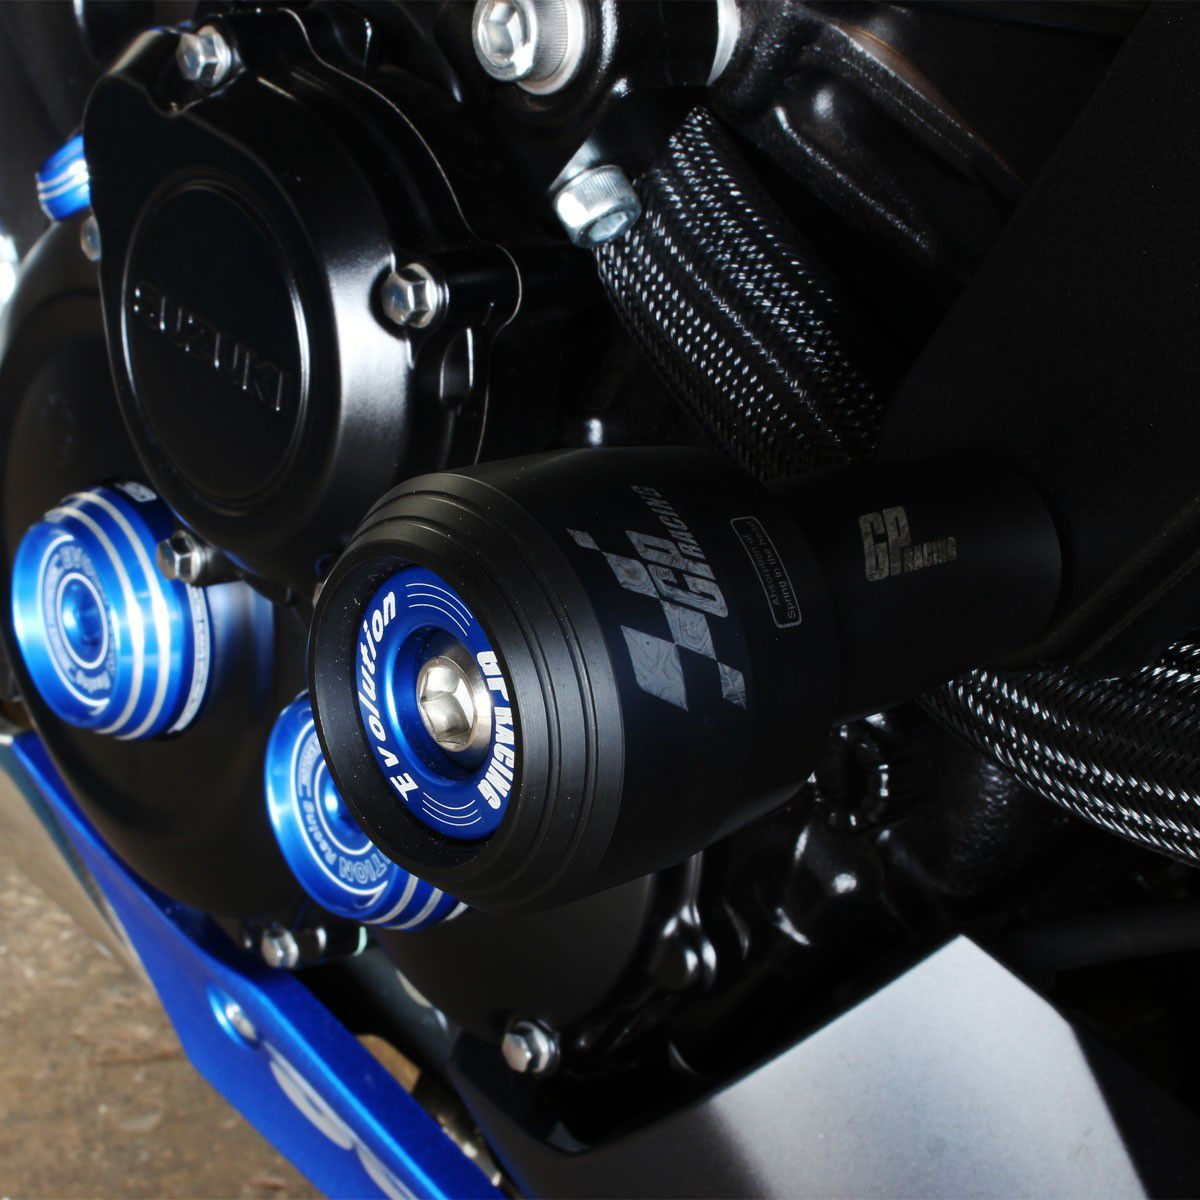 Slider Evolution GP Nylon Yamaha YZF R1 07 08